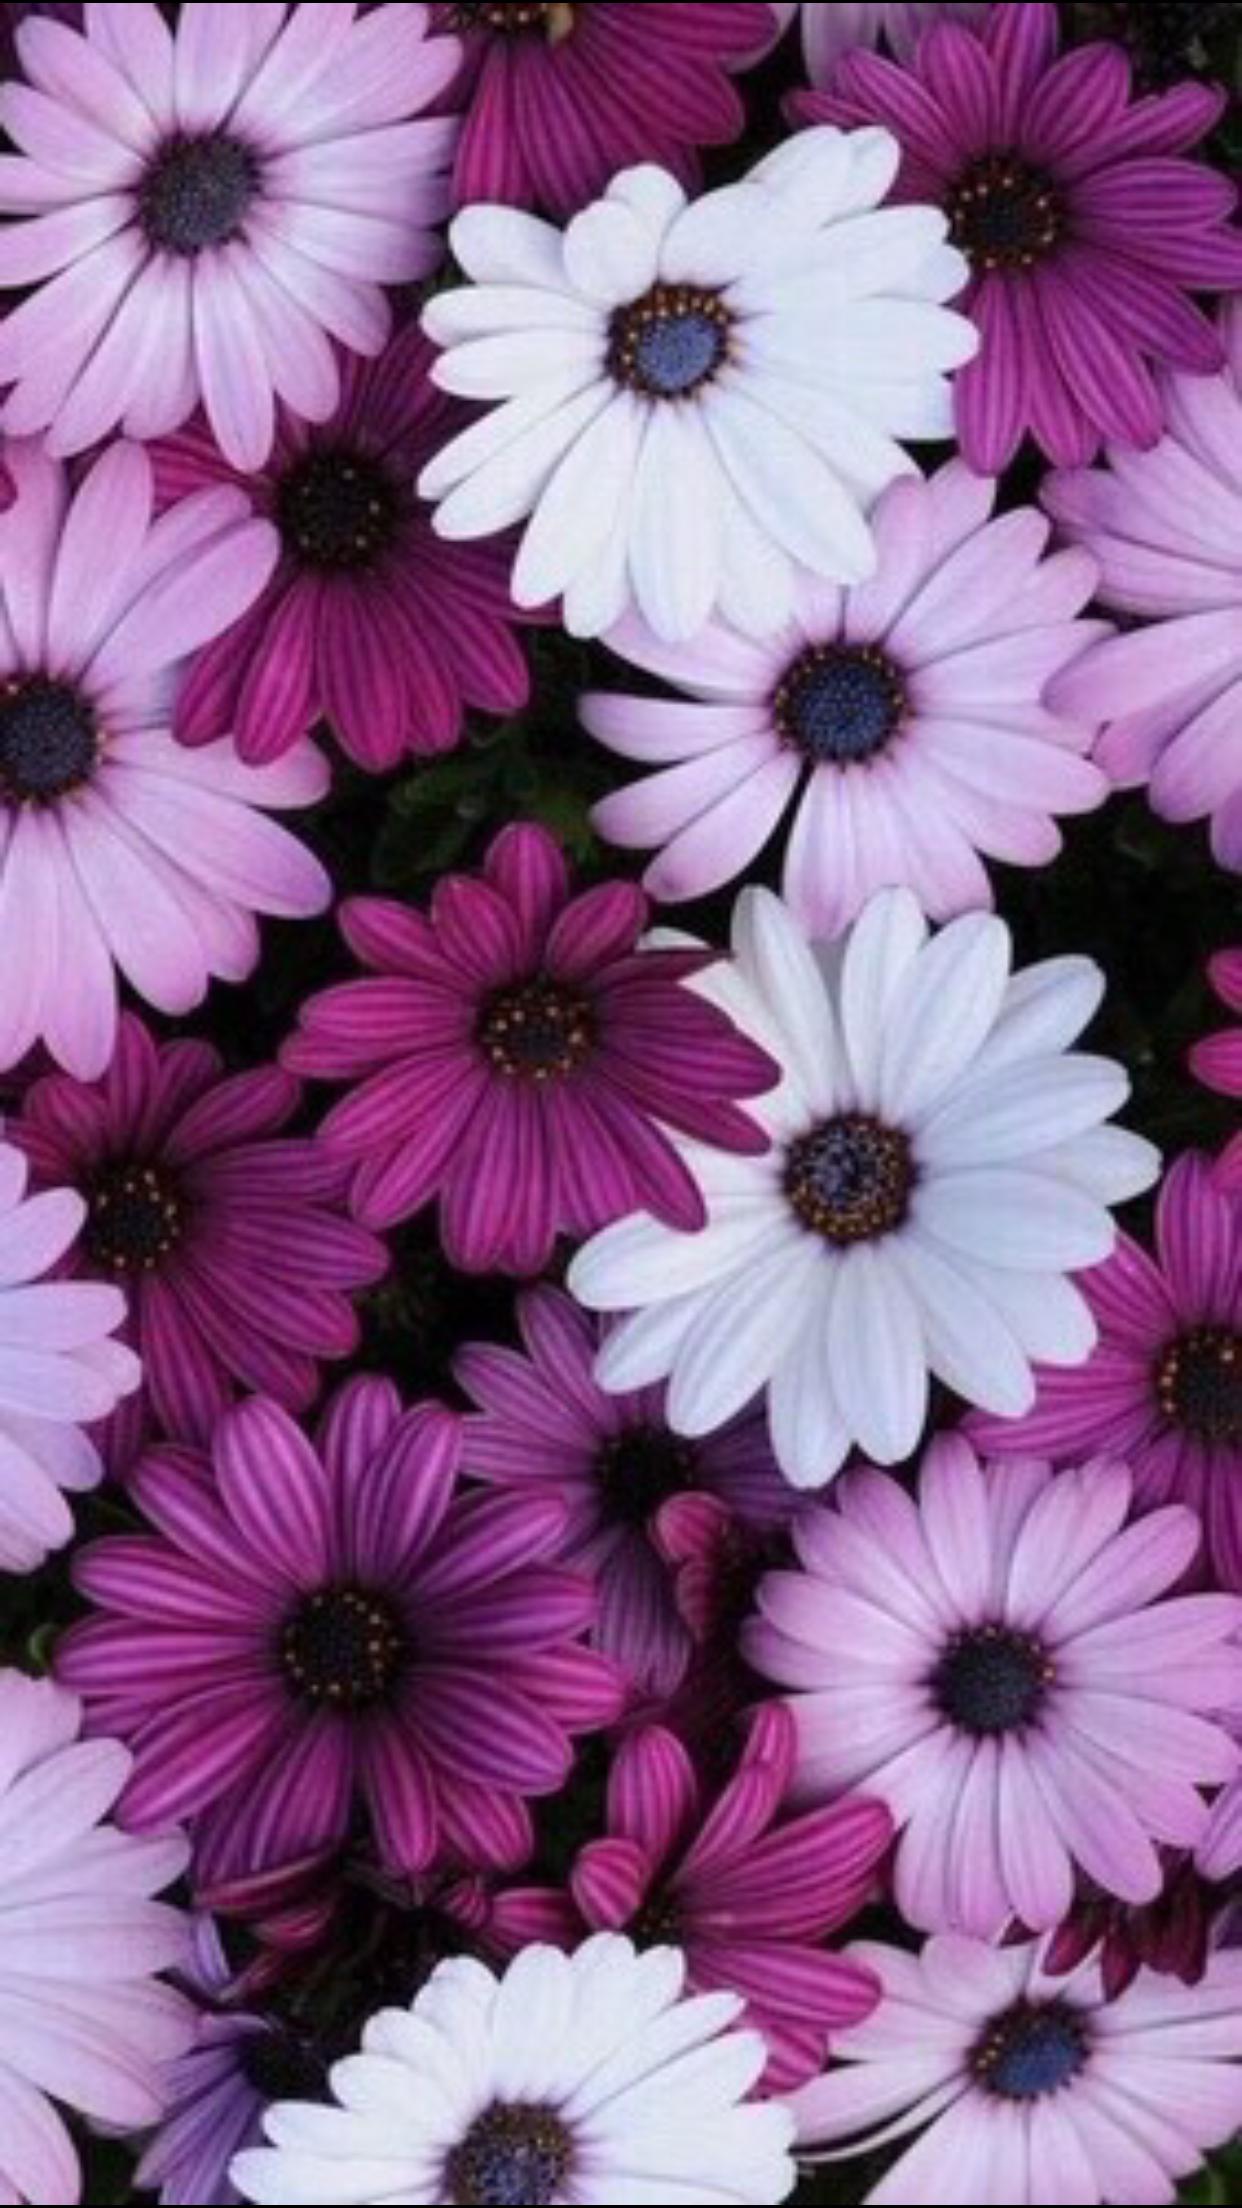 Pin de dany bautista en flor fondo pantalla celular for Imagenes de fondos bonitos